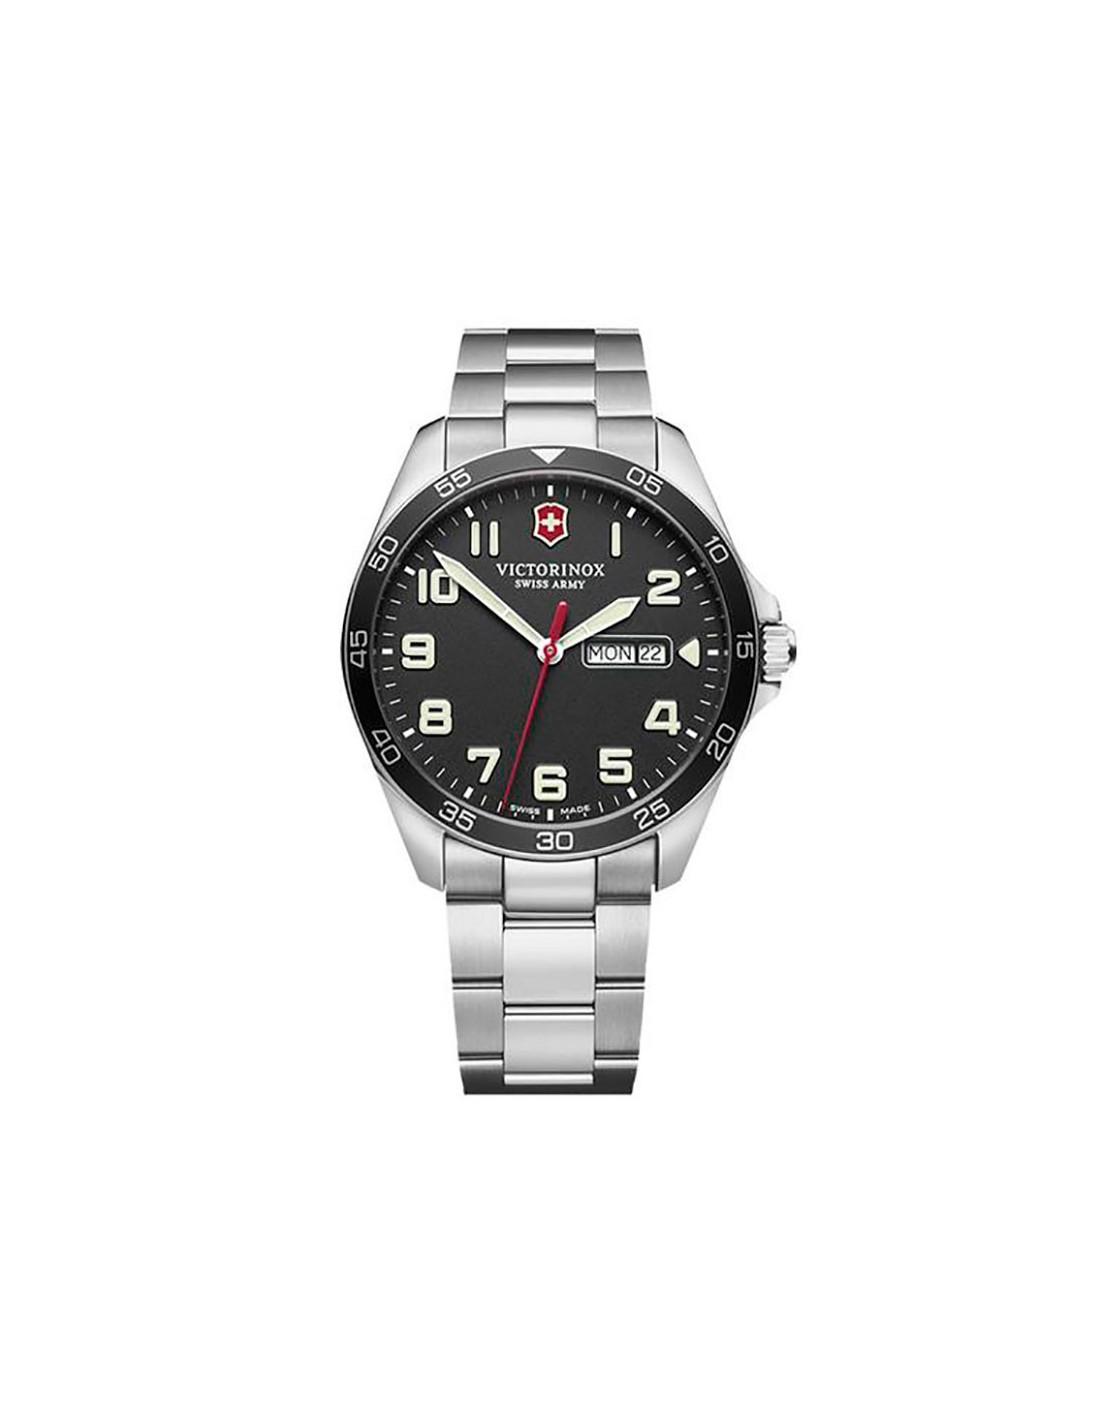 V241849 Victorinox Watch Swiss Army Fieldforce V241849